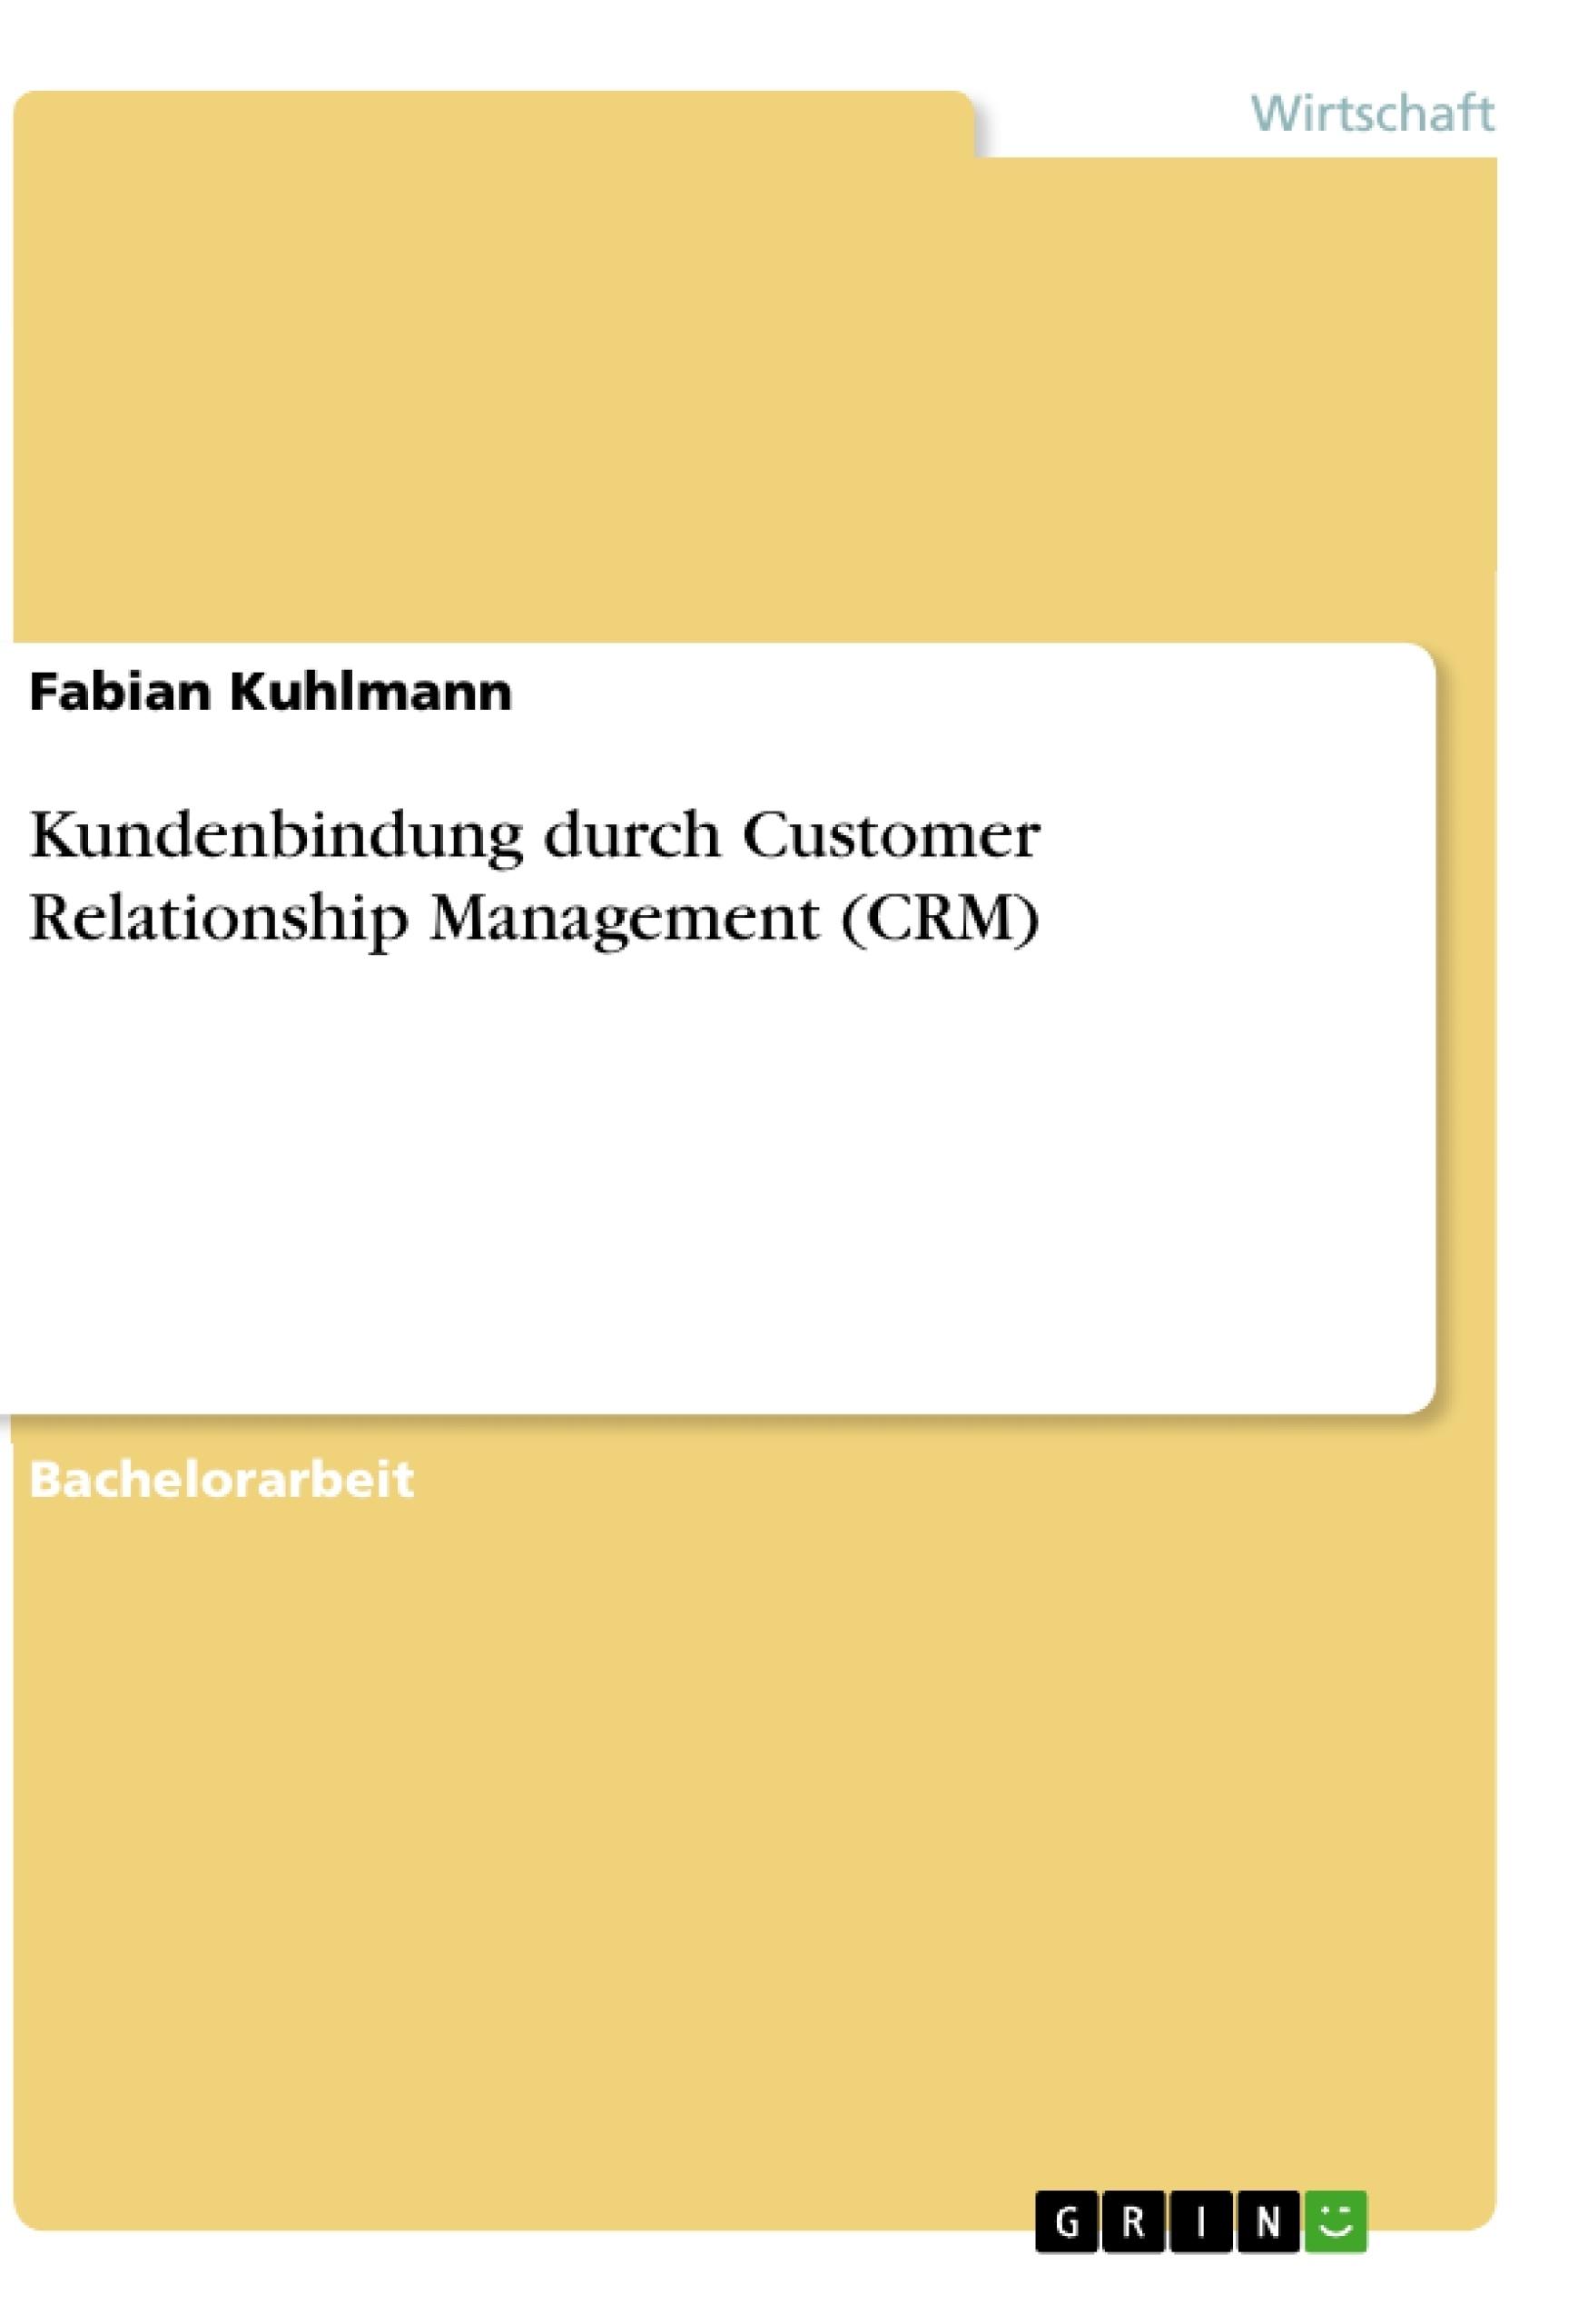 Titel: Kundenbindung durch Customer Relationship Management (CRM)